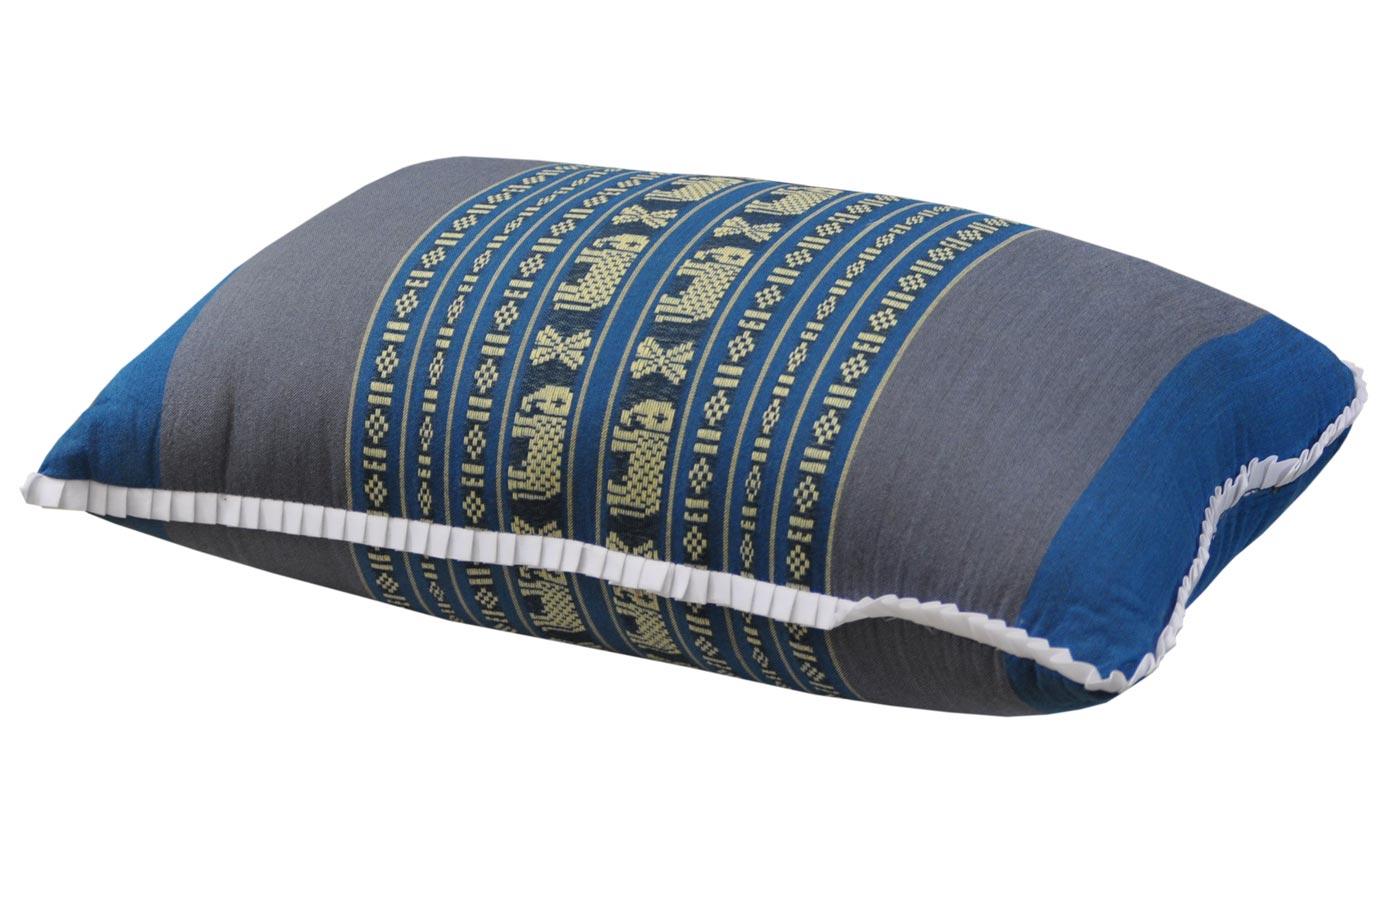 coussin de canap bleu gris motifs l phants. Black Bedroom Furniture Sets. Home Design Ideas